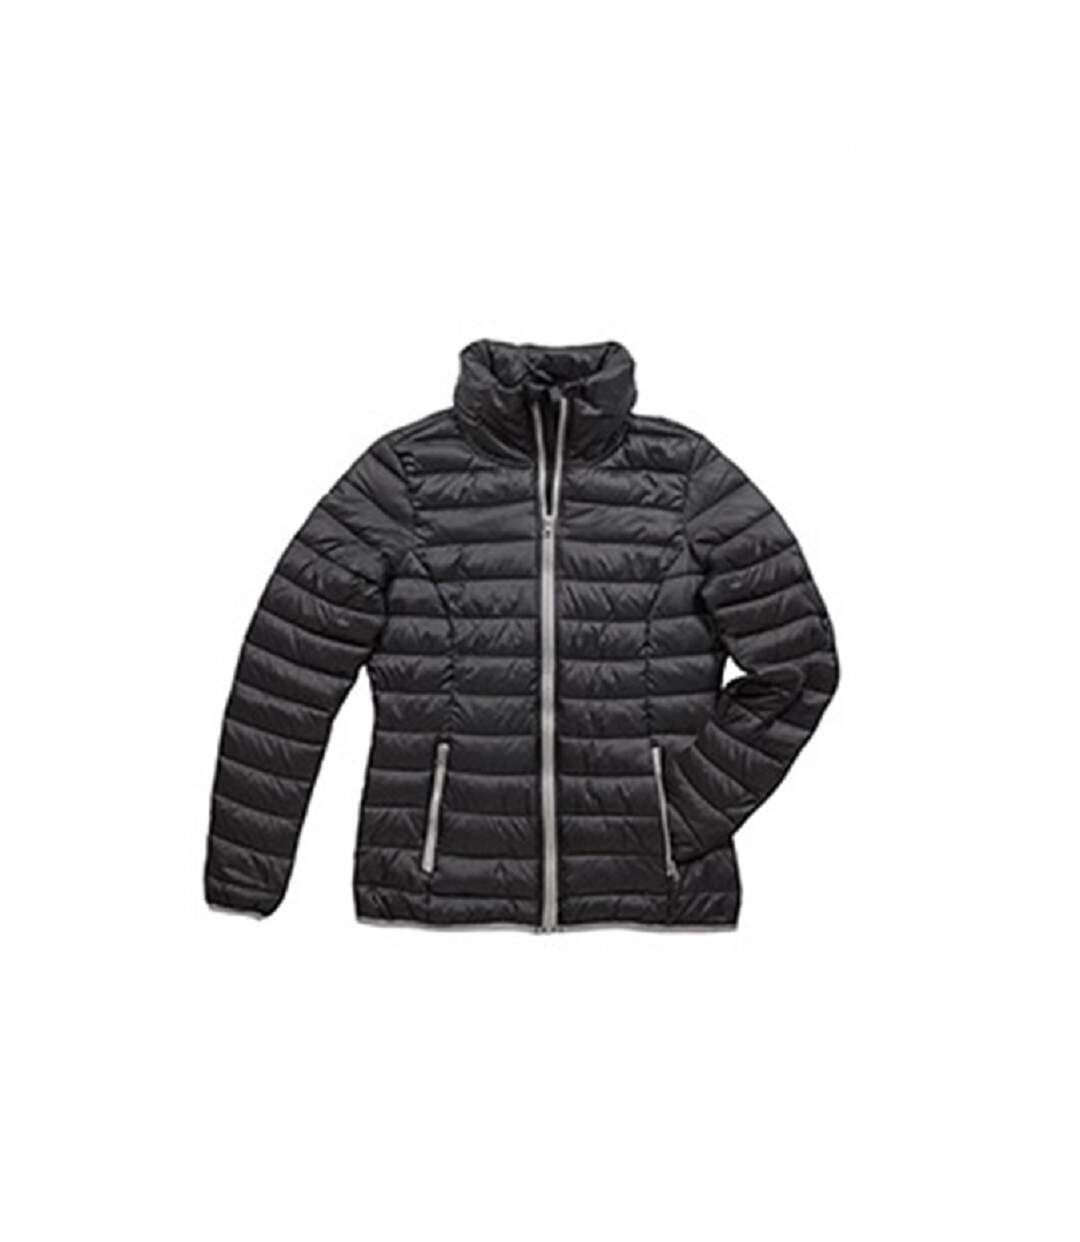 Stedman Womens/Ladies Active Padded Jacket (Black Opal) - UTAB313